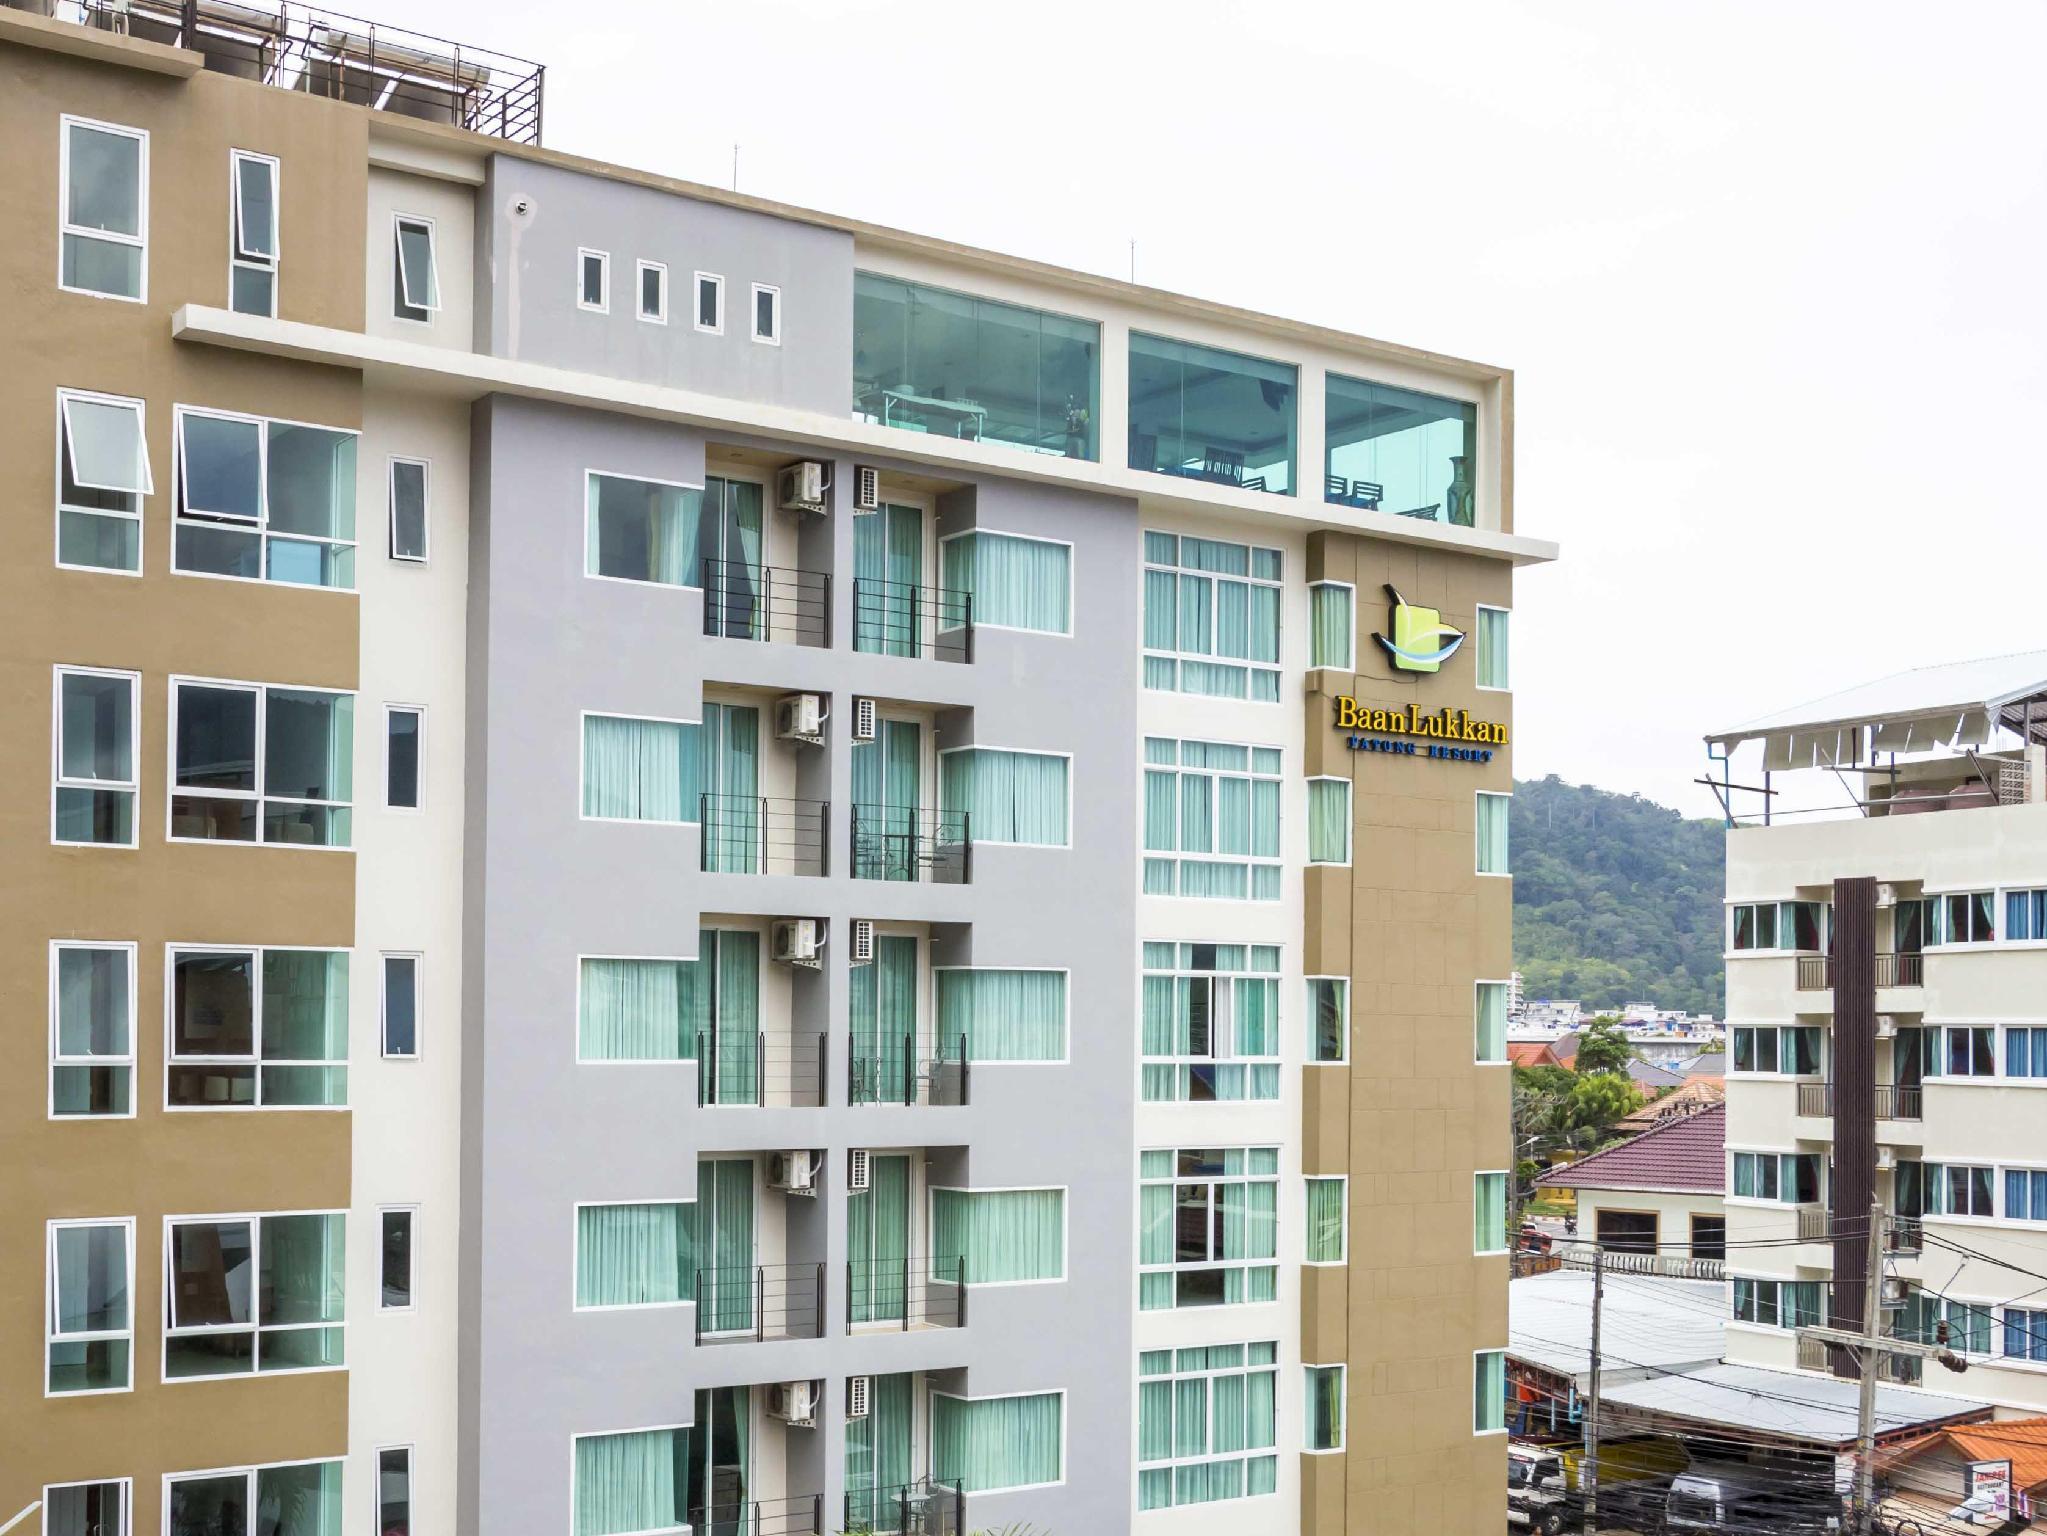 Baan Lukkan Patong Resort